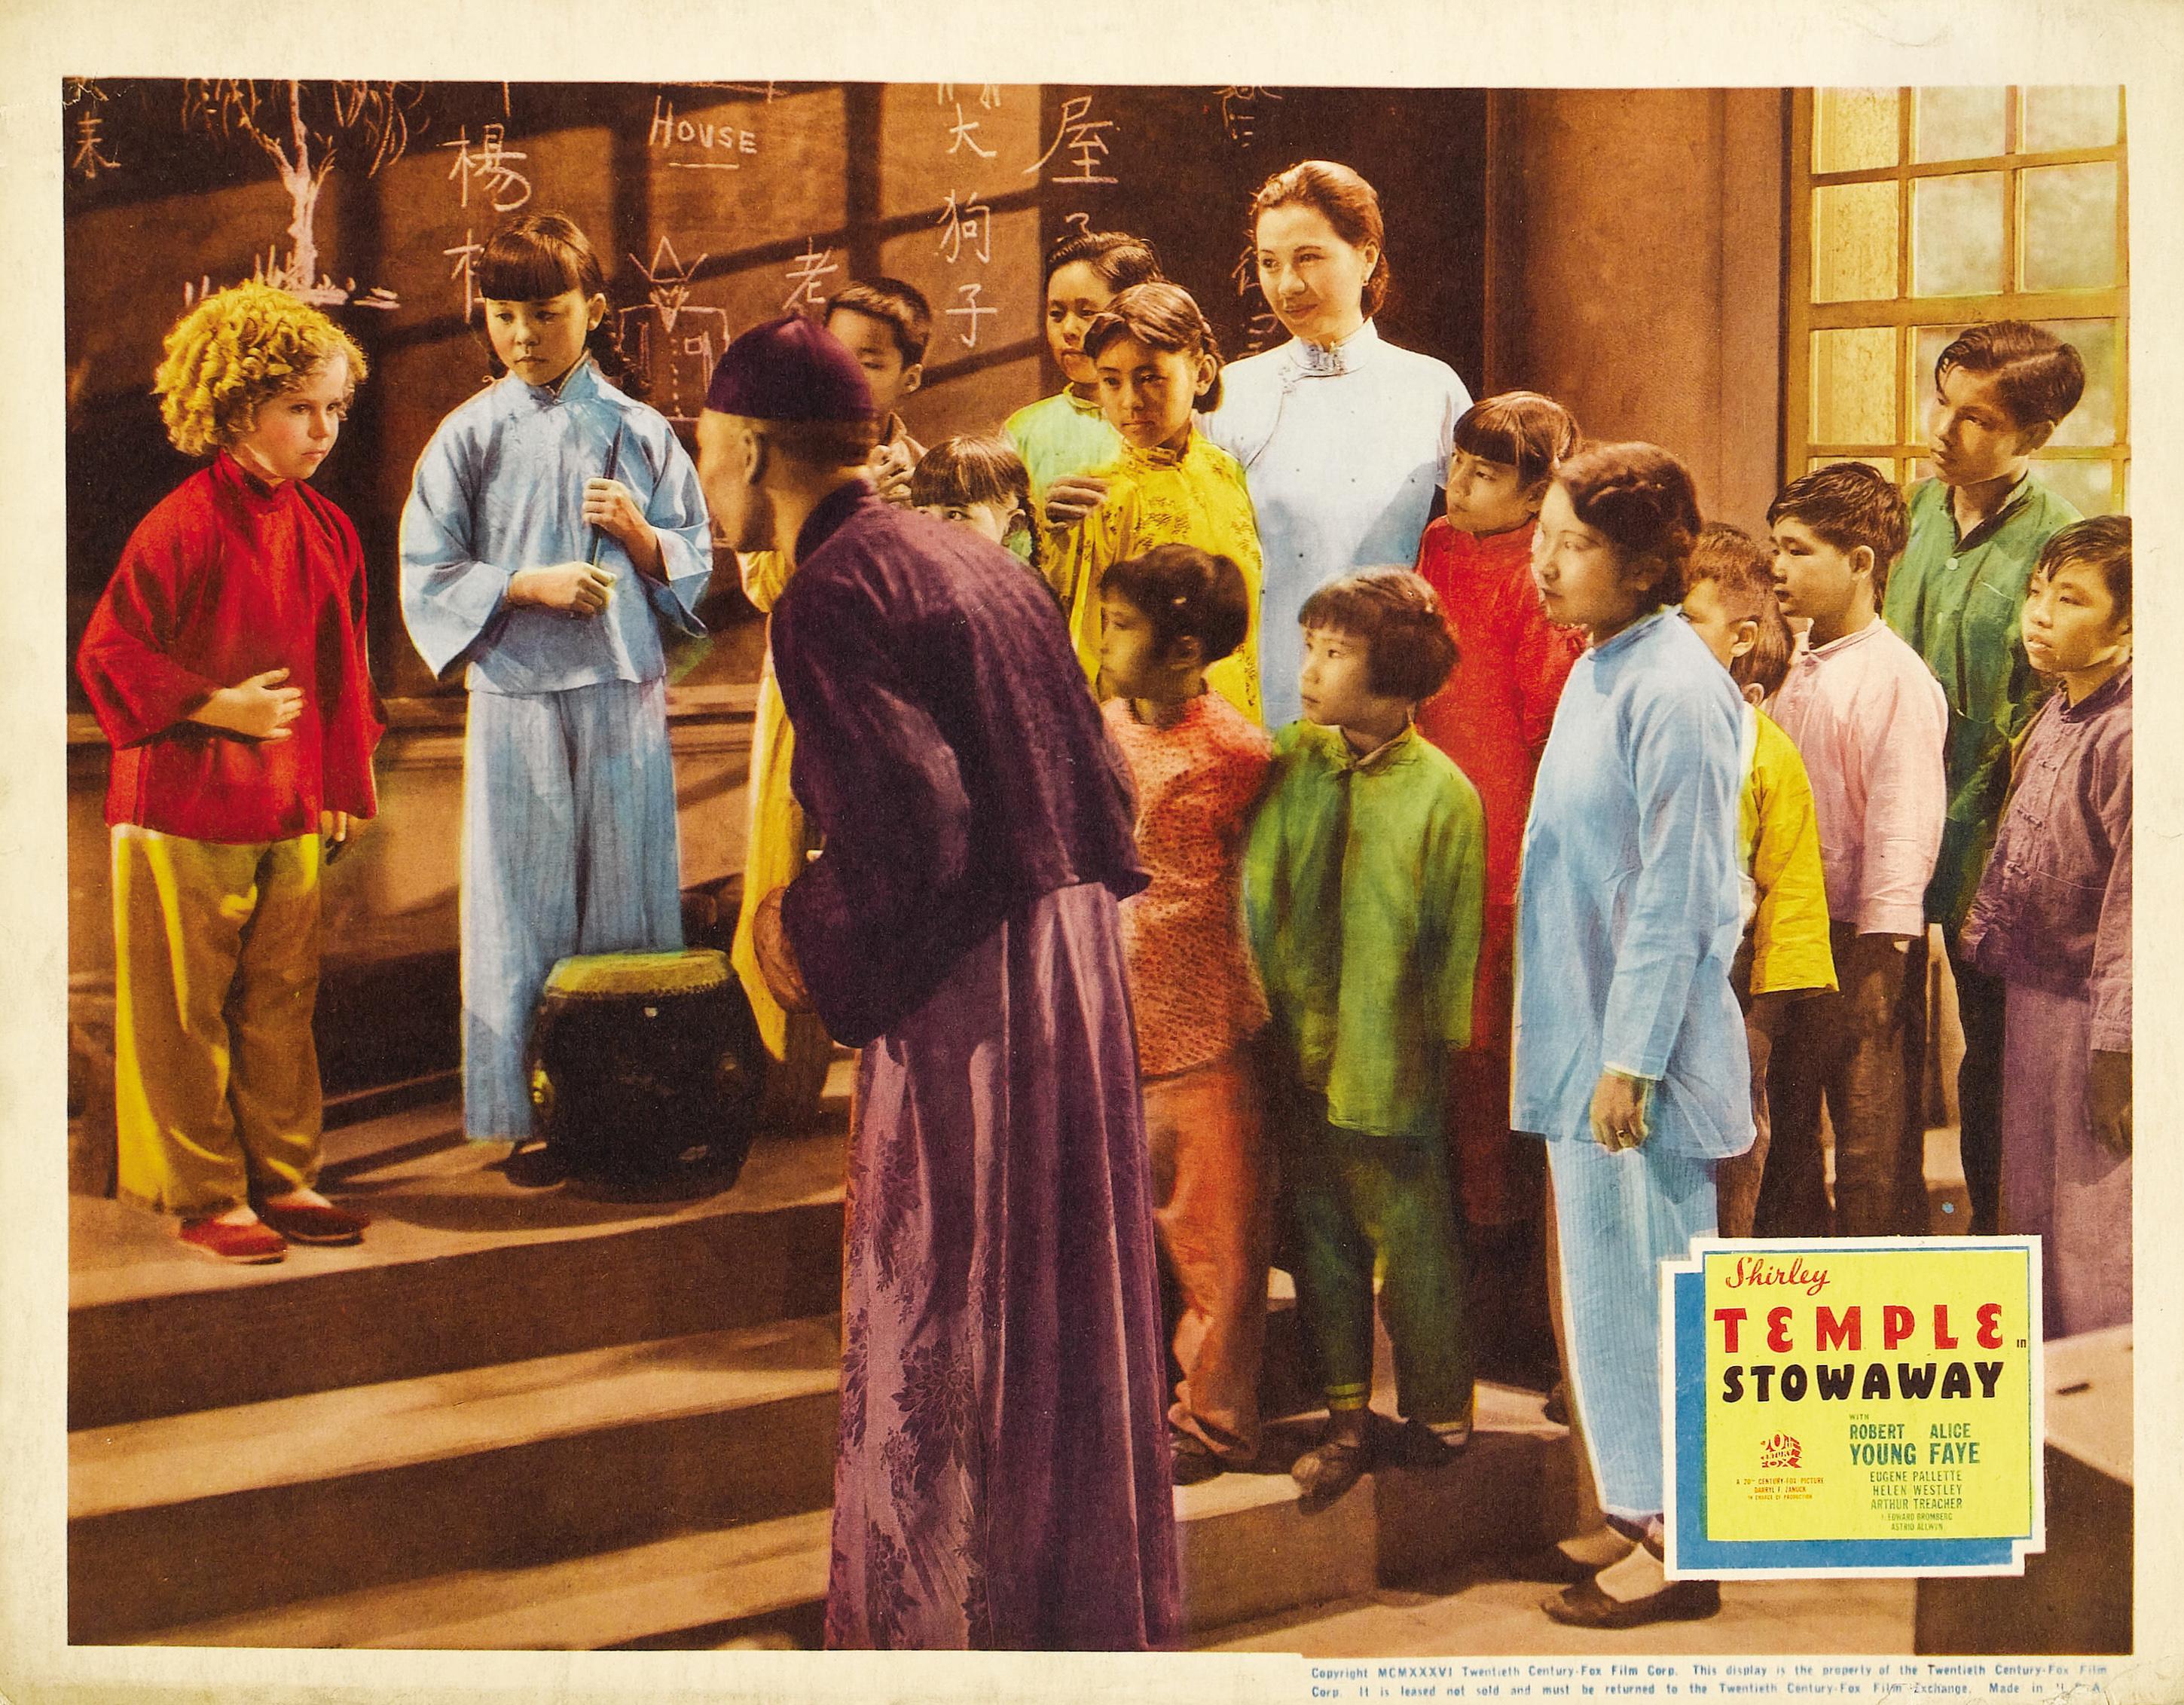 Shirley Temple, Philip Ahn, Layne Tom Jr., and Sammee Tong in Stowaway (1936)